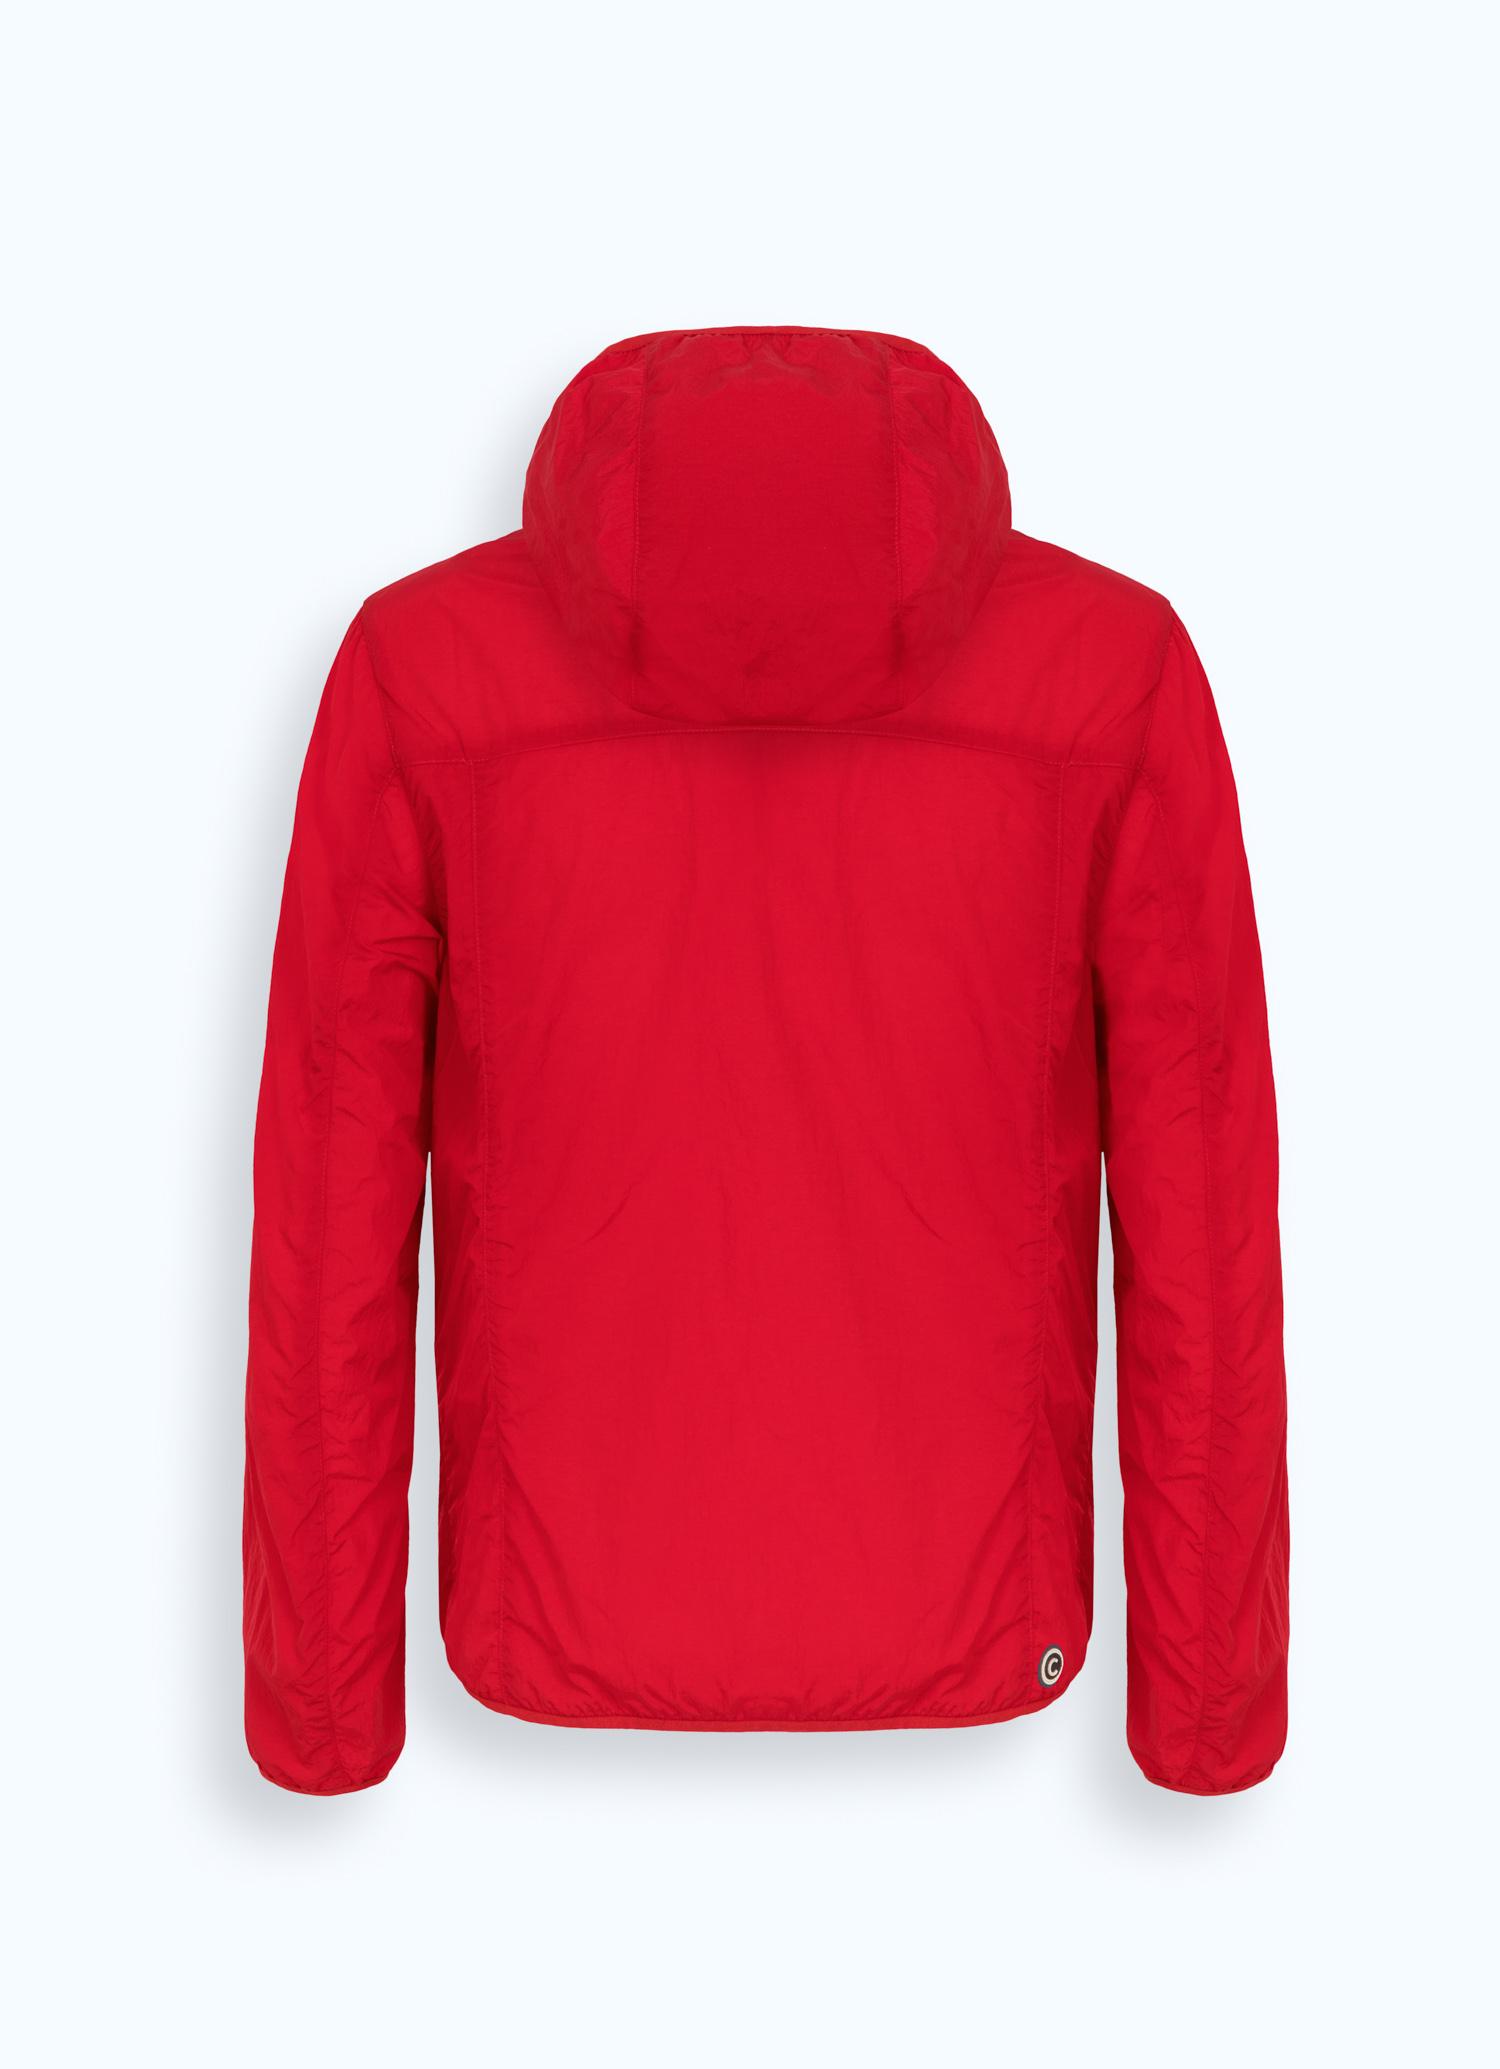 Giacca packable da uomo Colmar Originals con cappuccio - Colmar b55429e78c7